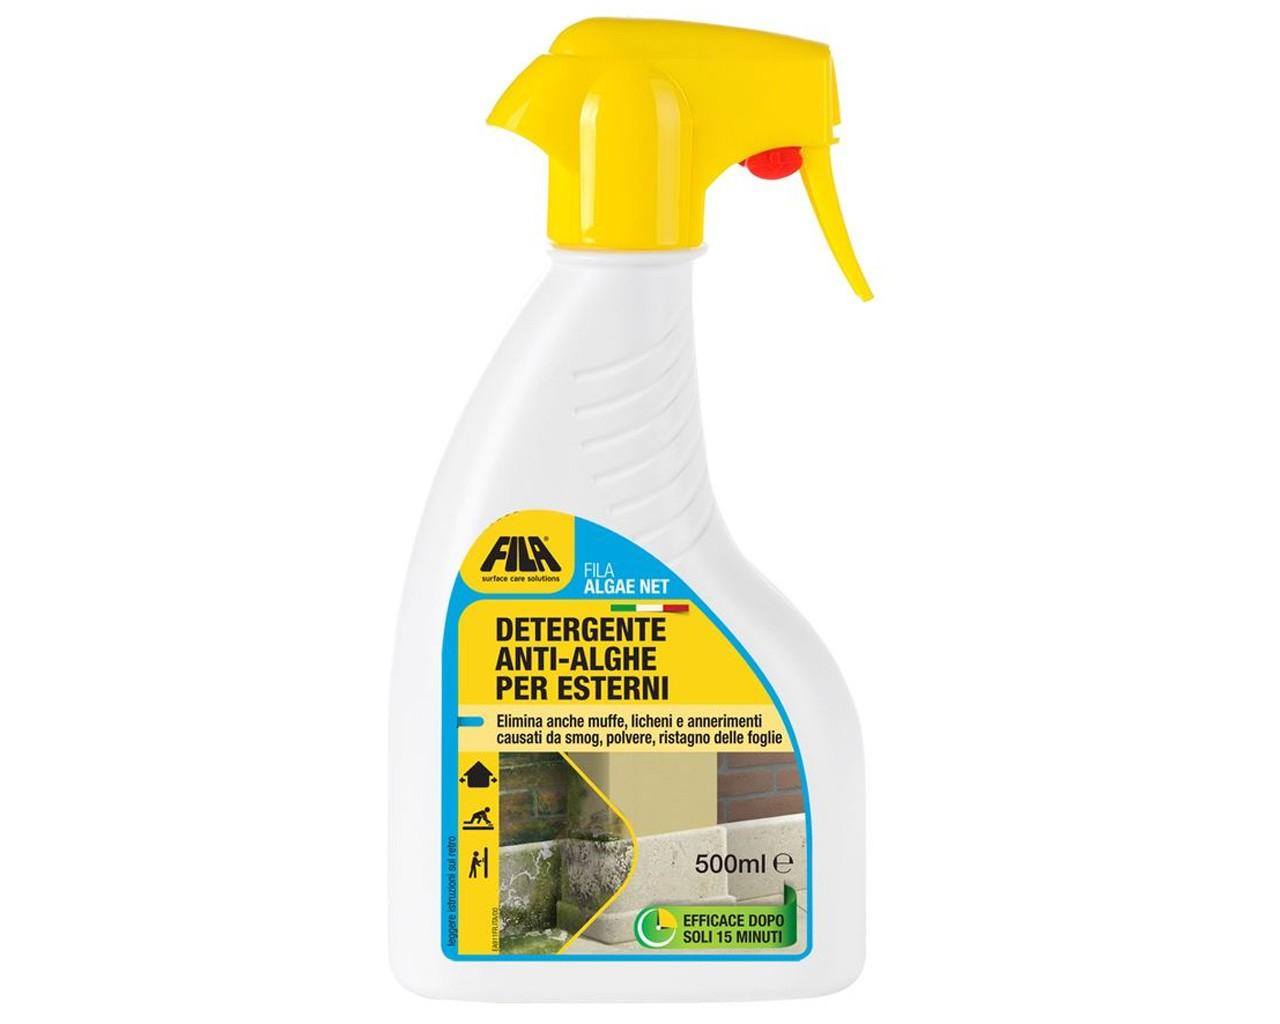 Detergente Per Cotto Esterno fila detergente antialghe per esterni filaalgae net ml.500